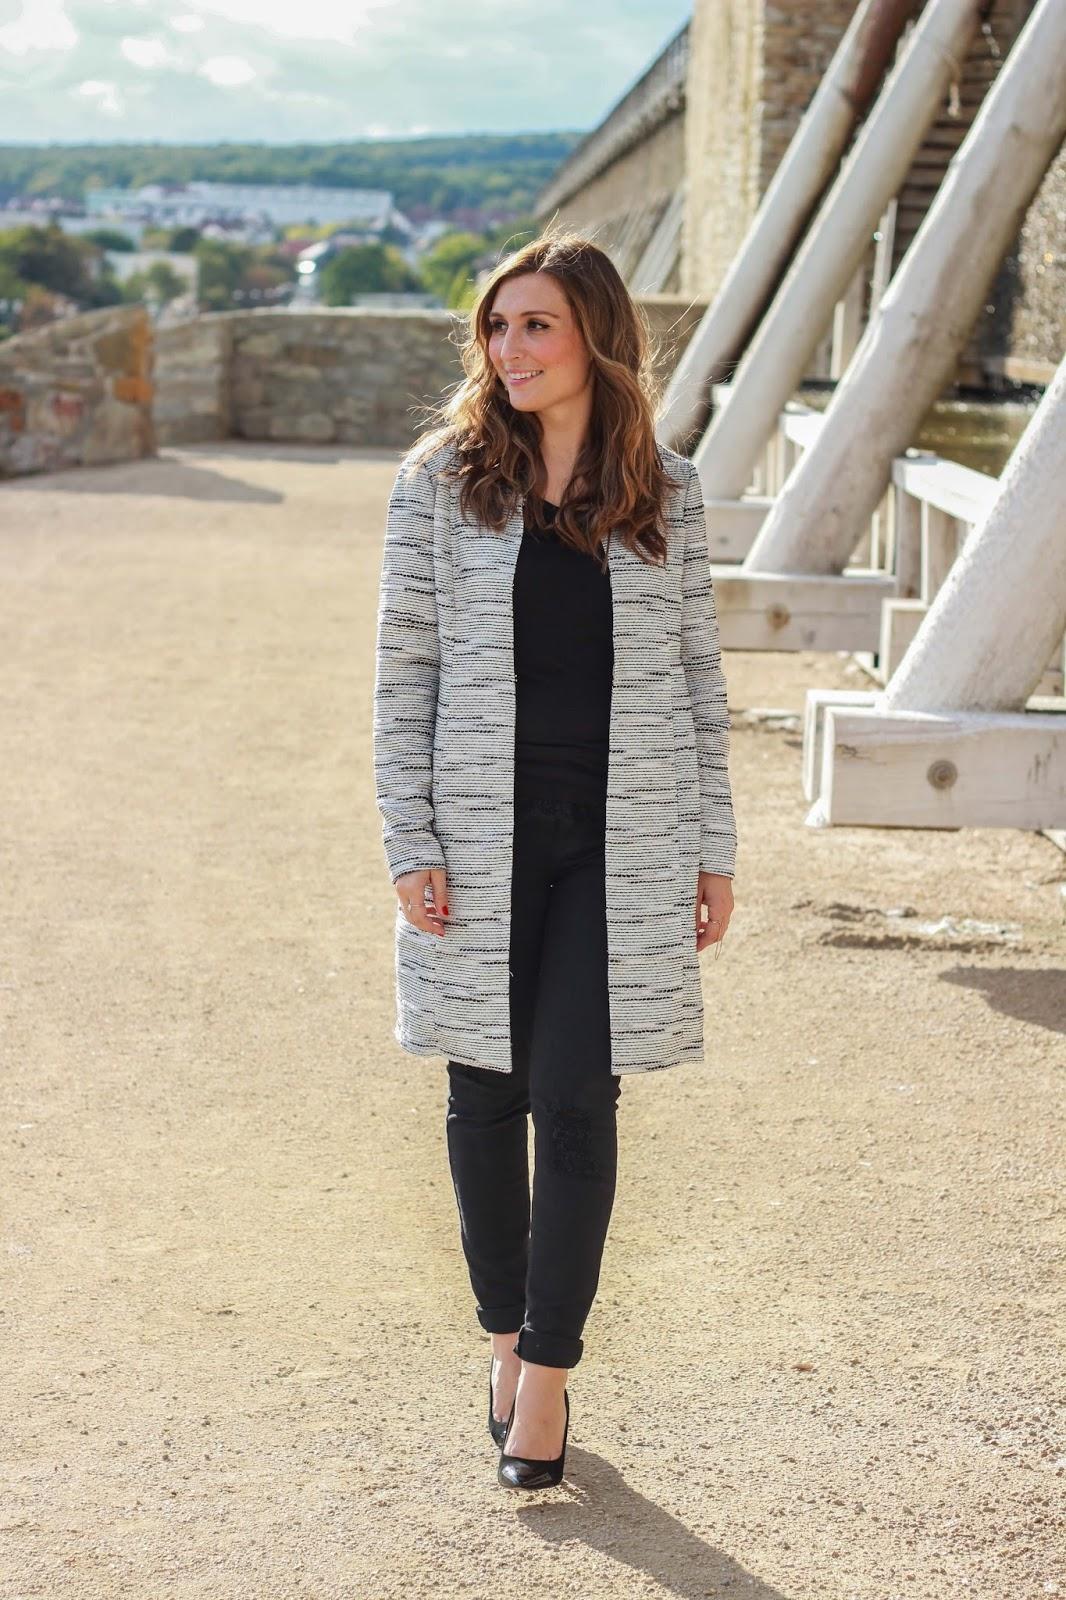 German Fashionblogger - Fashionstylebyjohanna im Mantel - Outfitinspiration - Fashionblog - Modeblogger